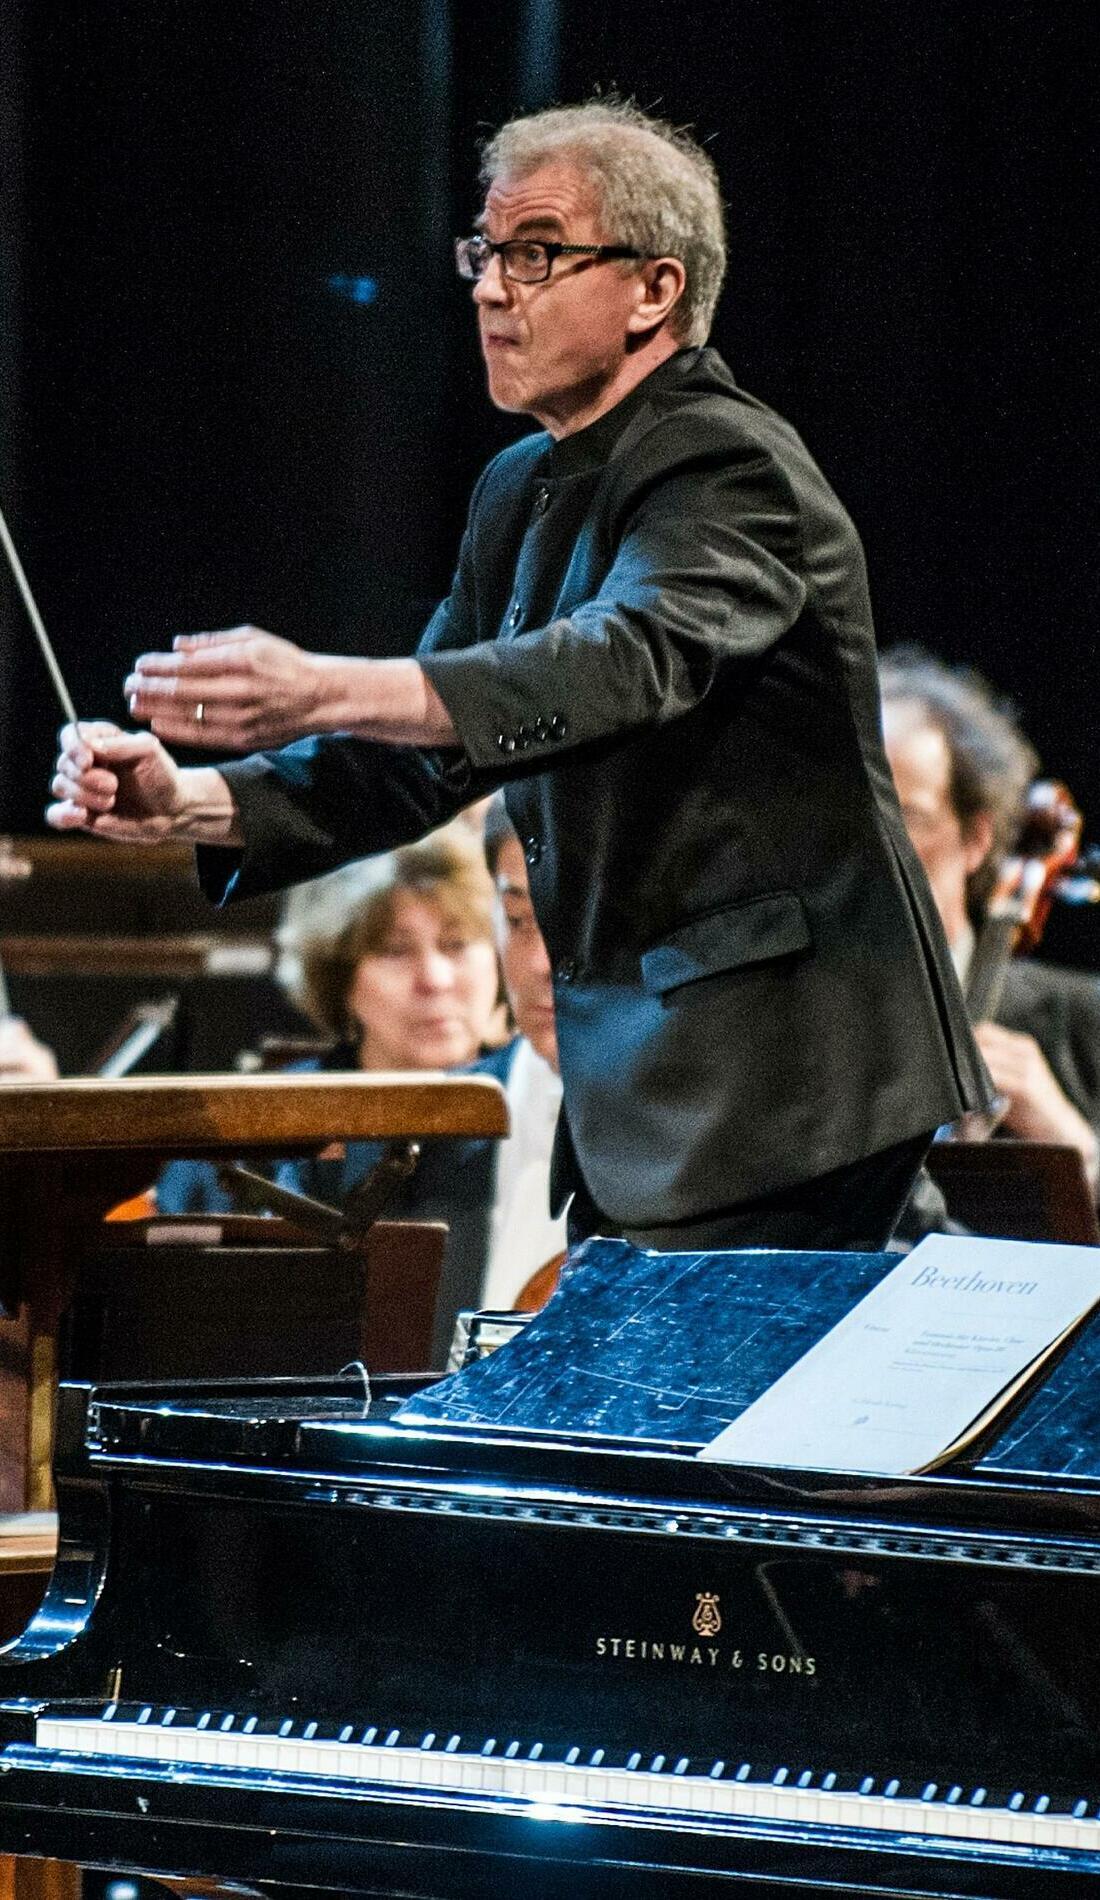 A Minnesota Orchestra live event